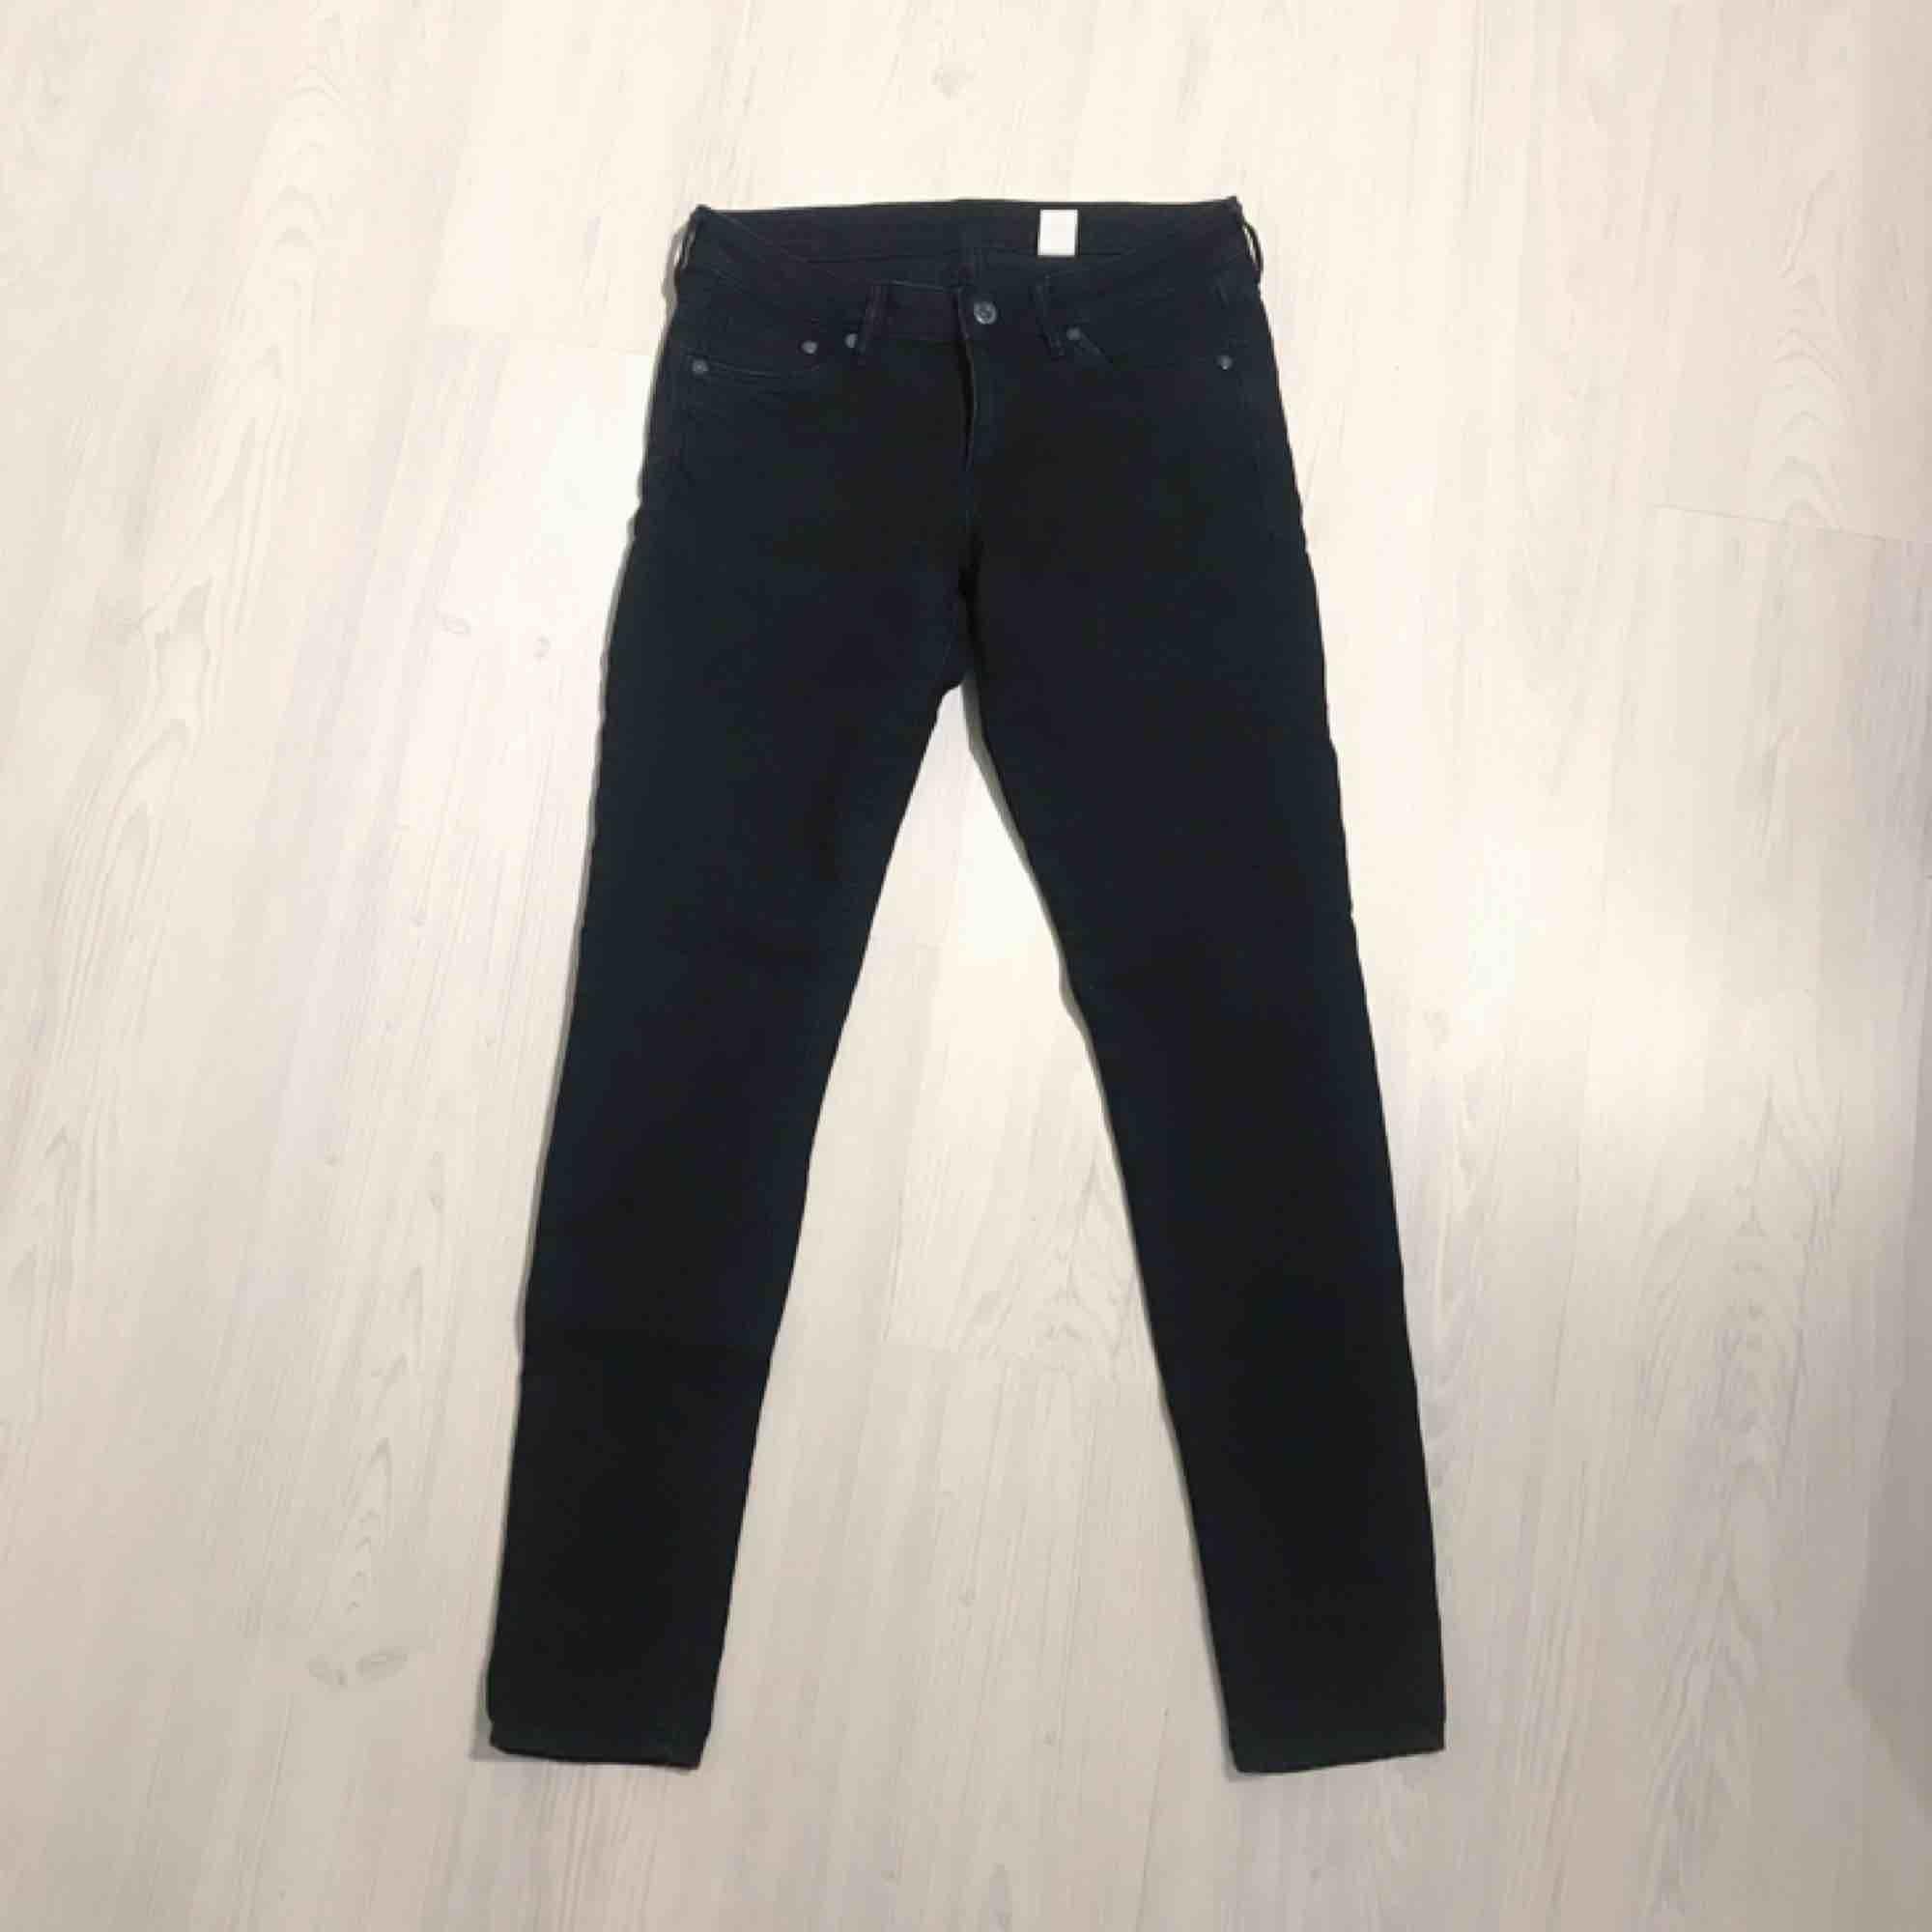 Svarta super skinny low waist jeans från H&M i normalt skick! Frakt på 55 kr tillkommer 🌟🌟. Jeans & Byxor.